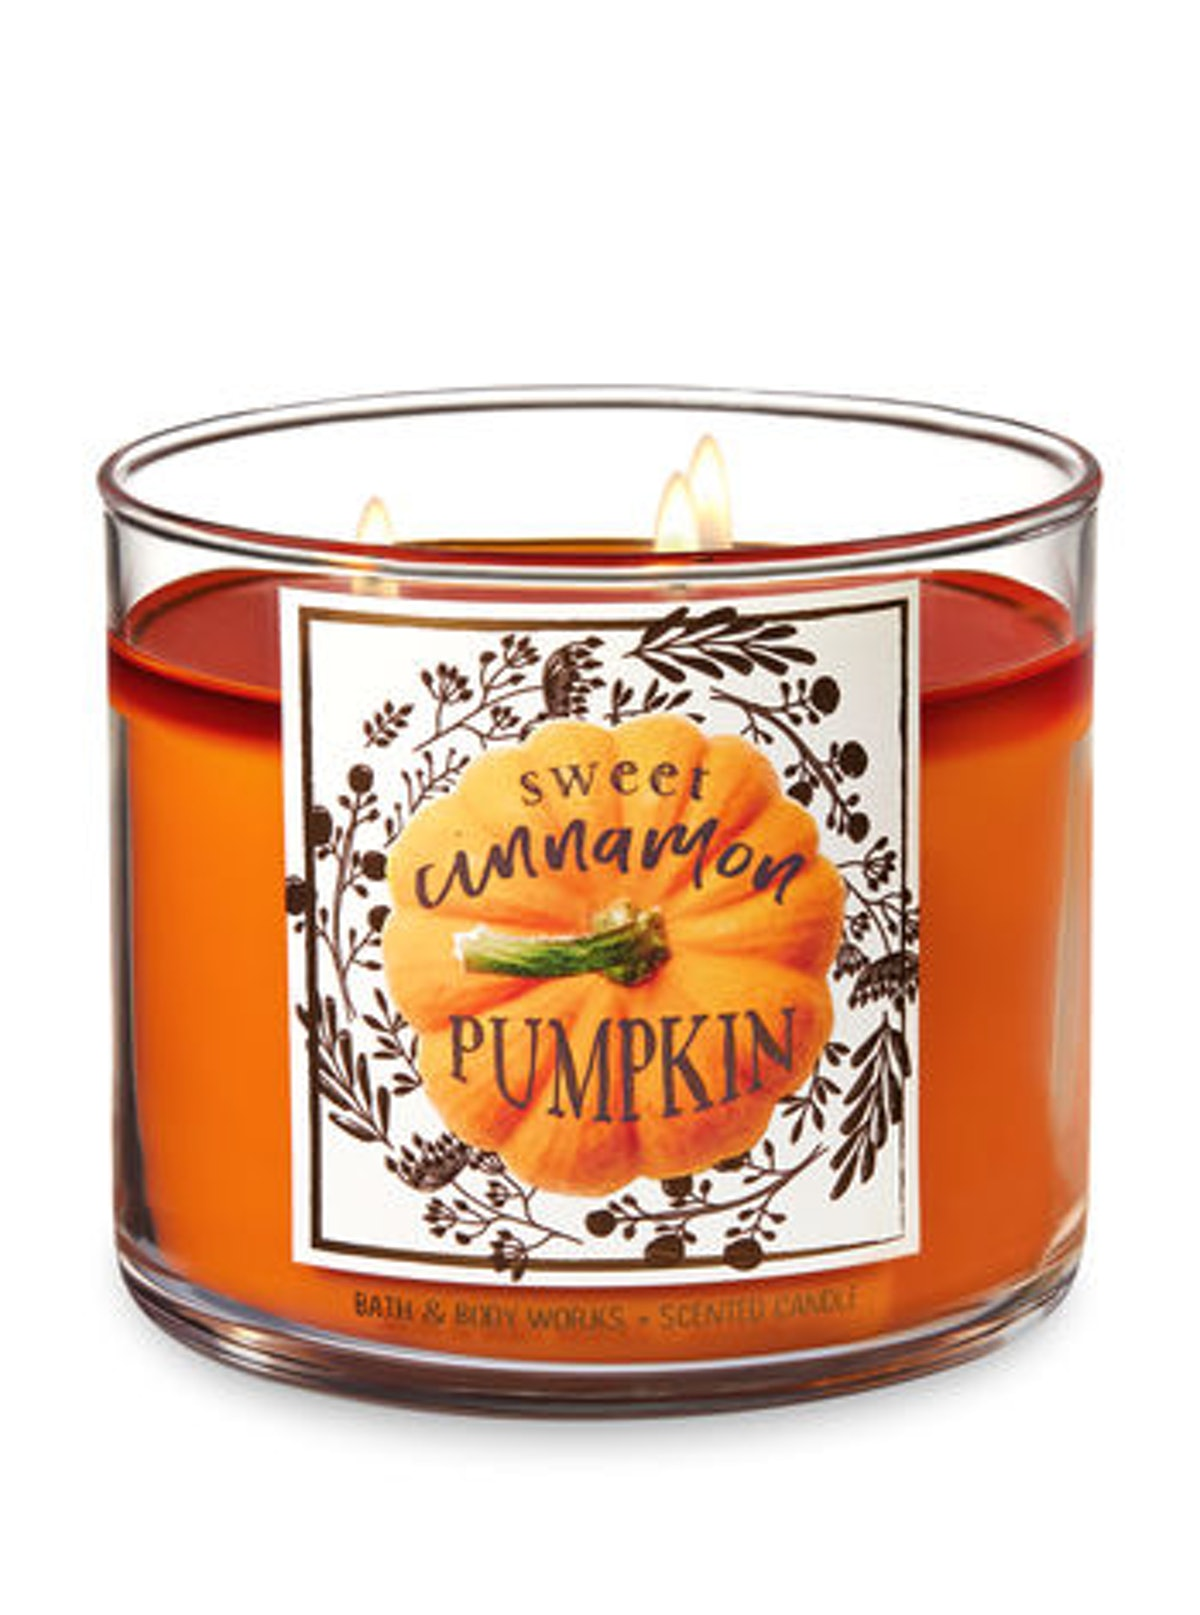 Sweet Cinnamon Pumpkin